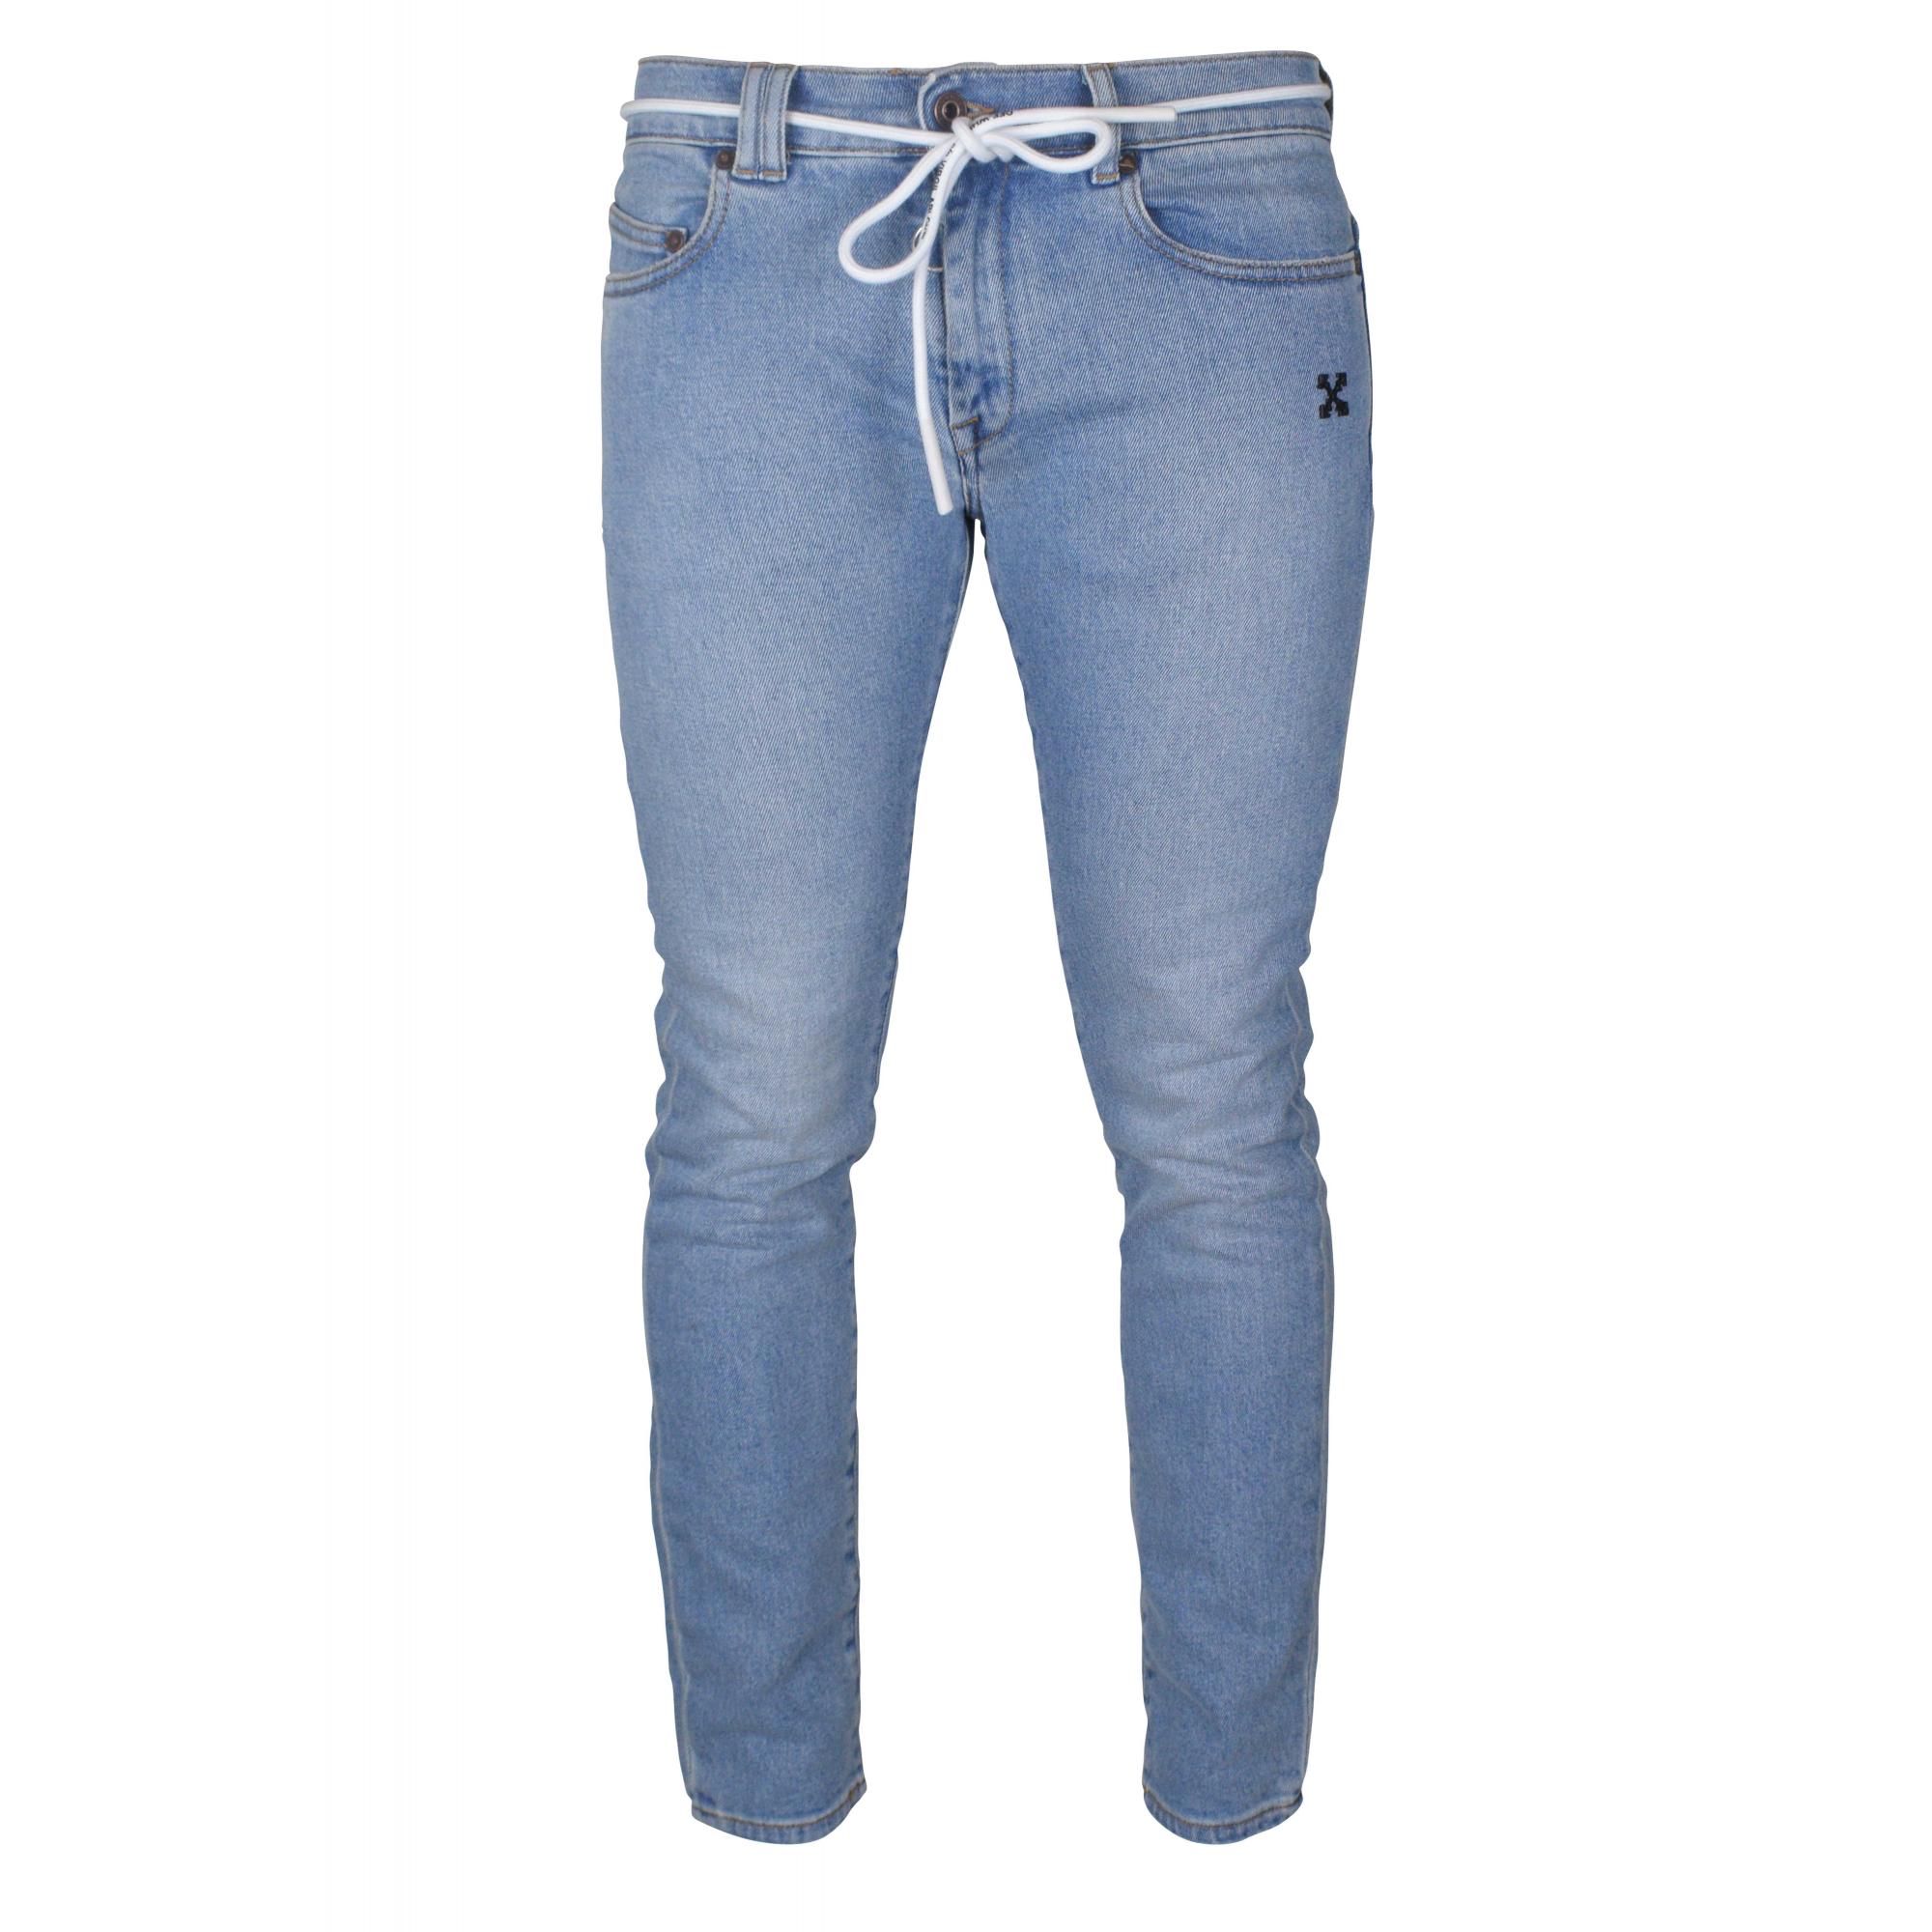 Blue Off-White slim jeans.